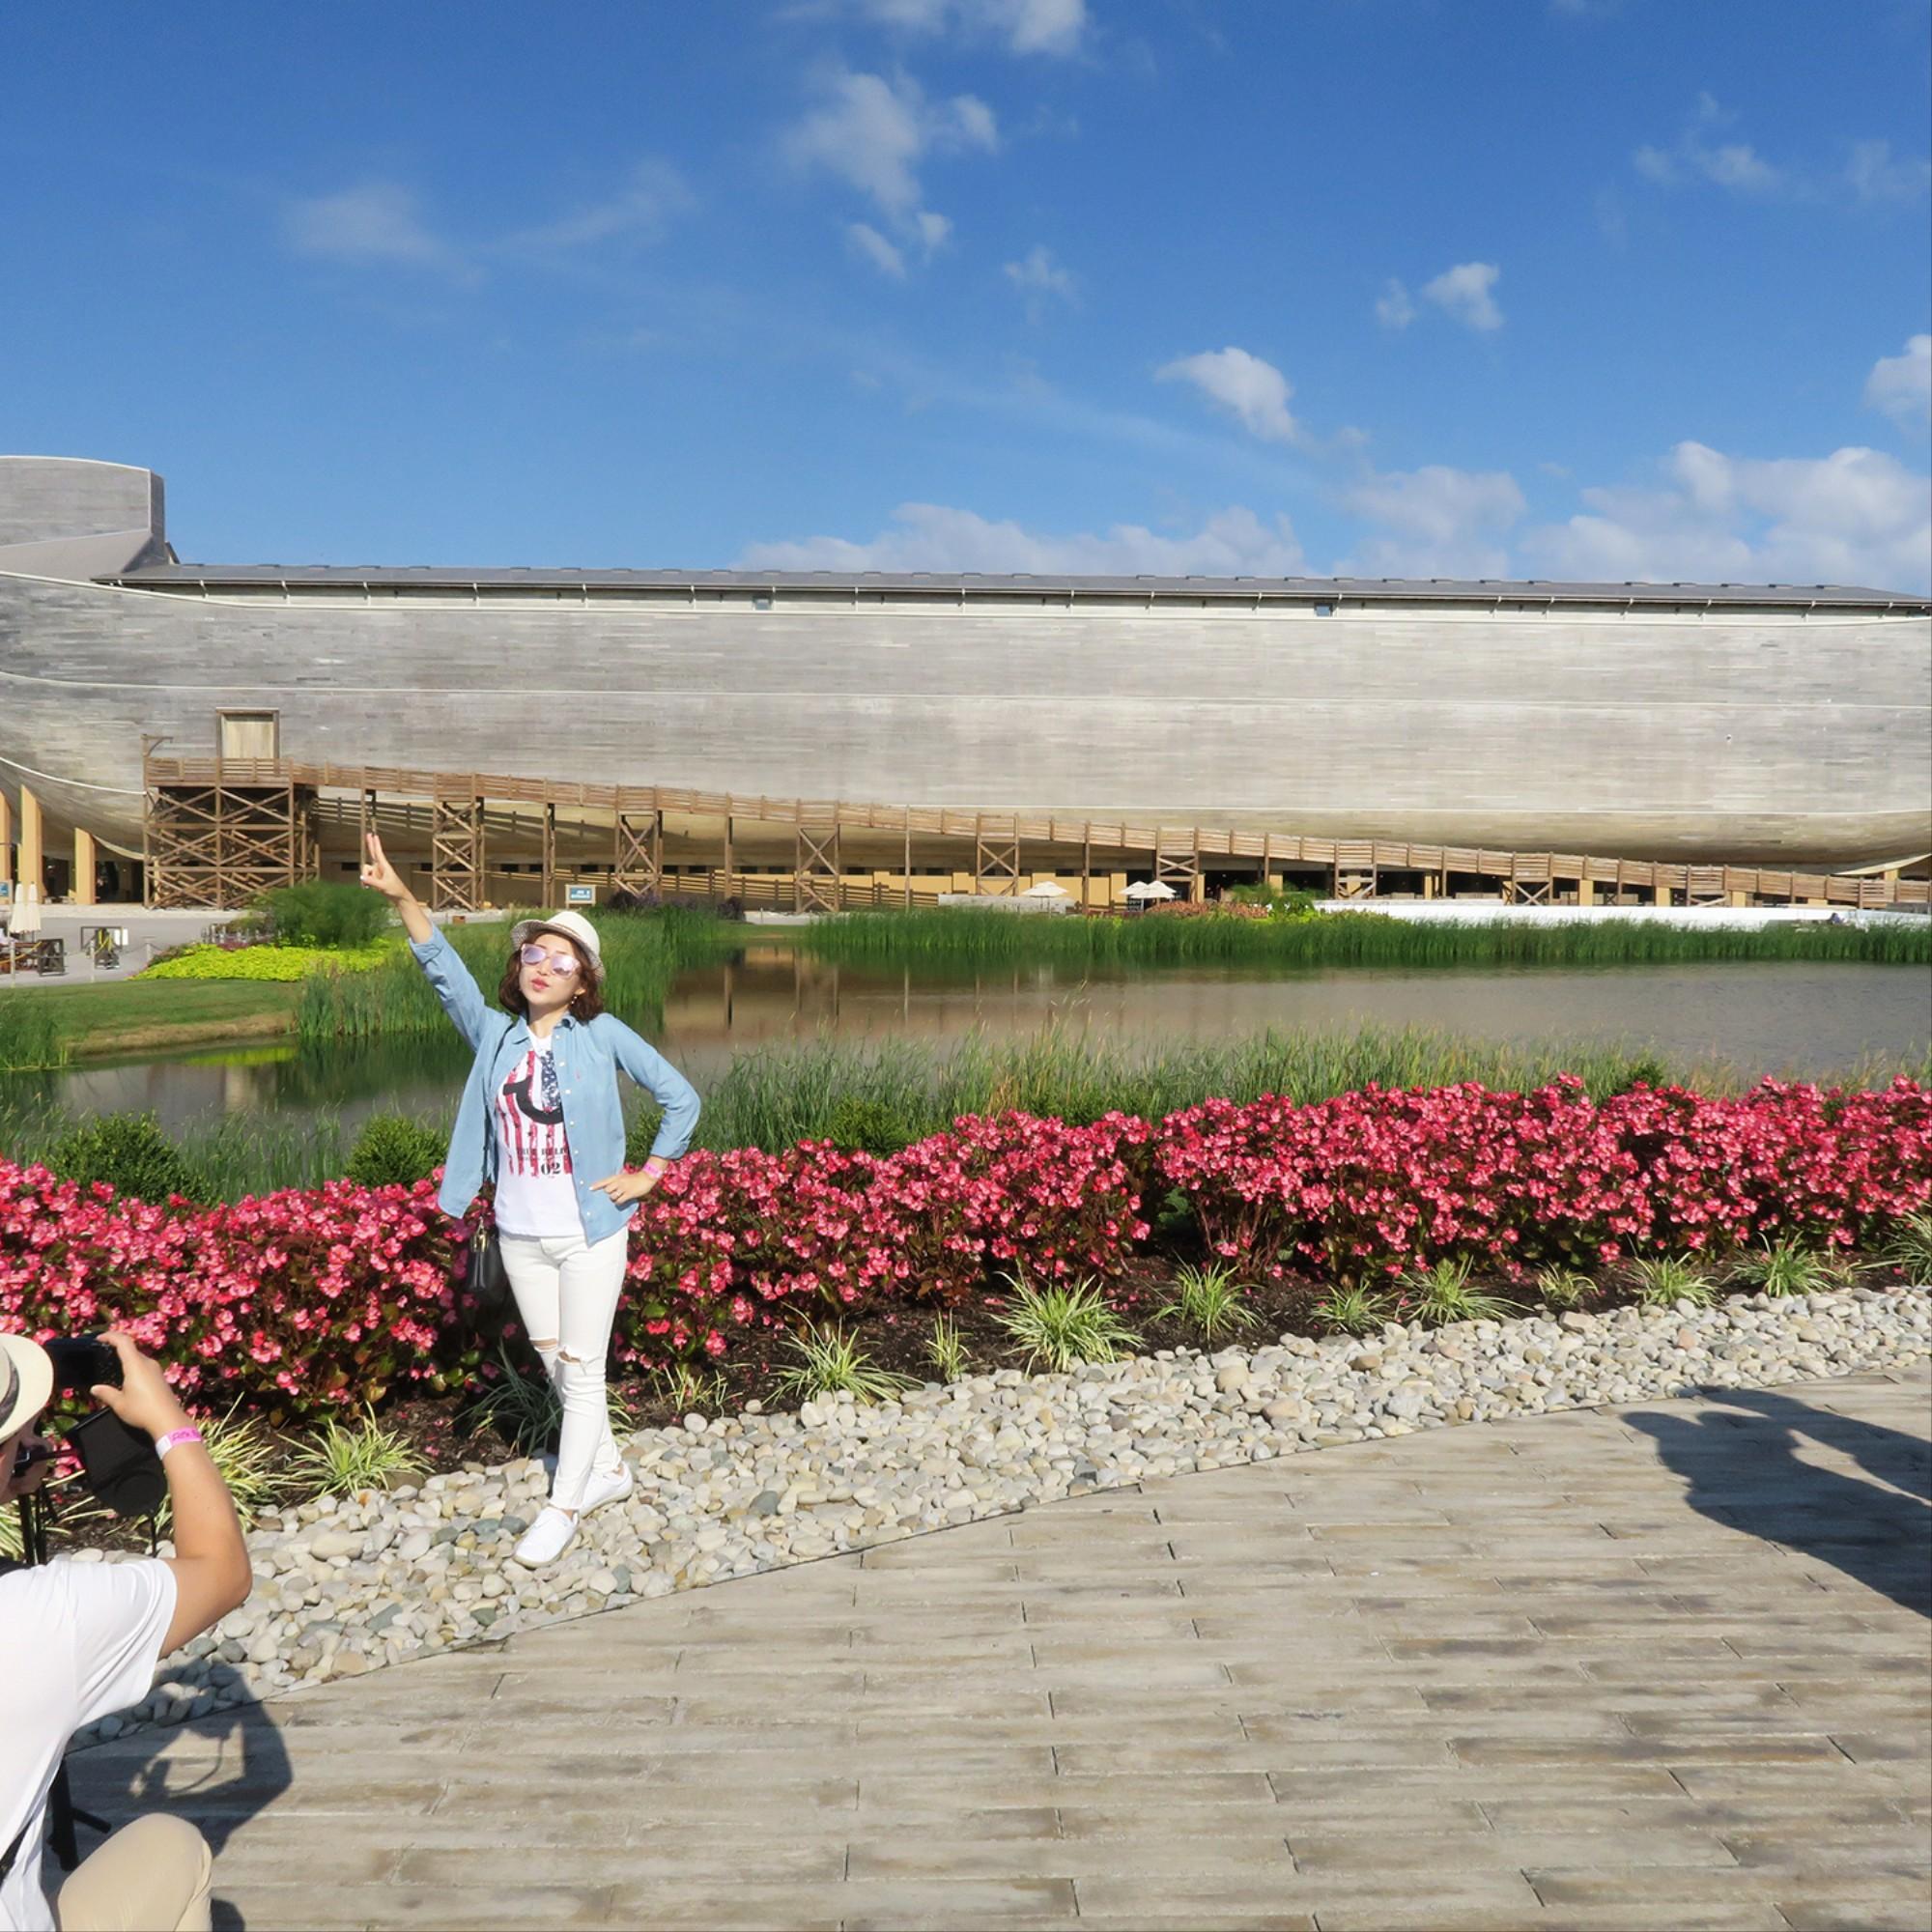 This 100 Million Noahs Ark Theme Park Is A Boring Homophobic Mess